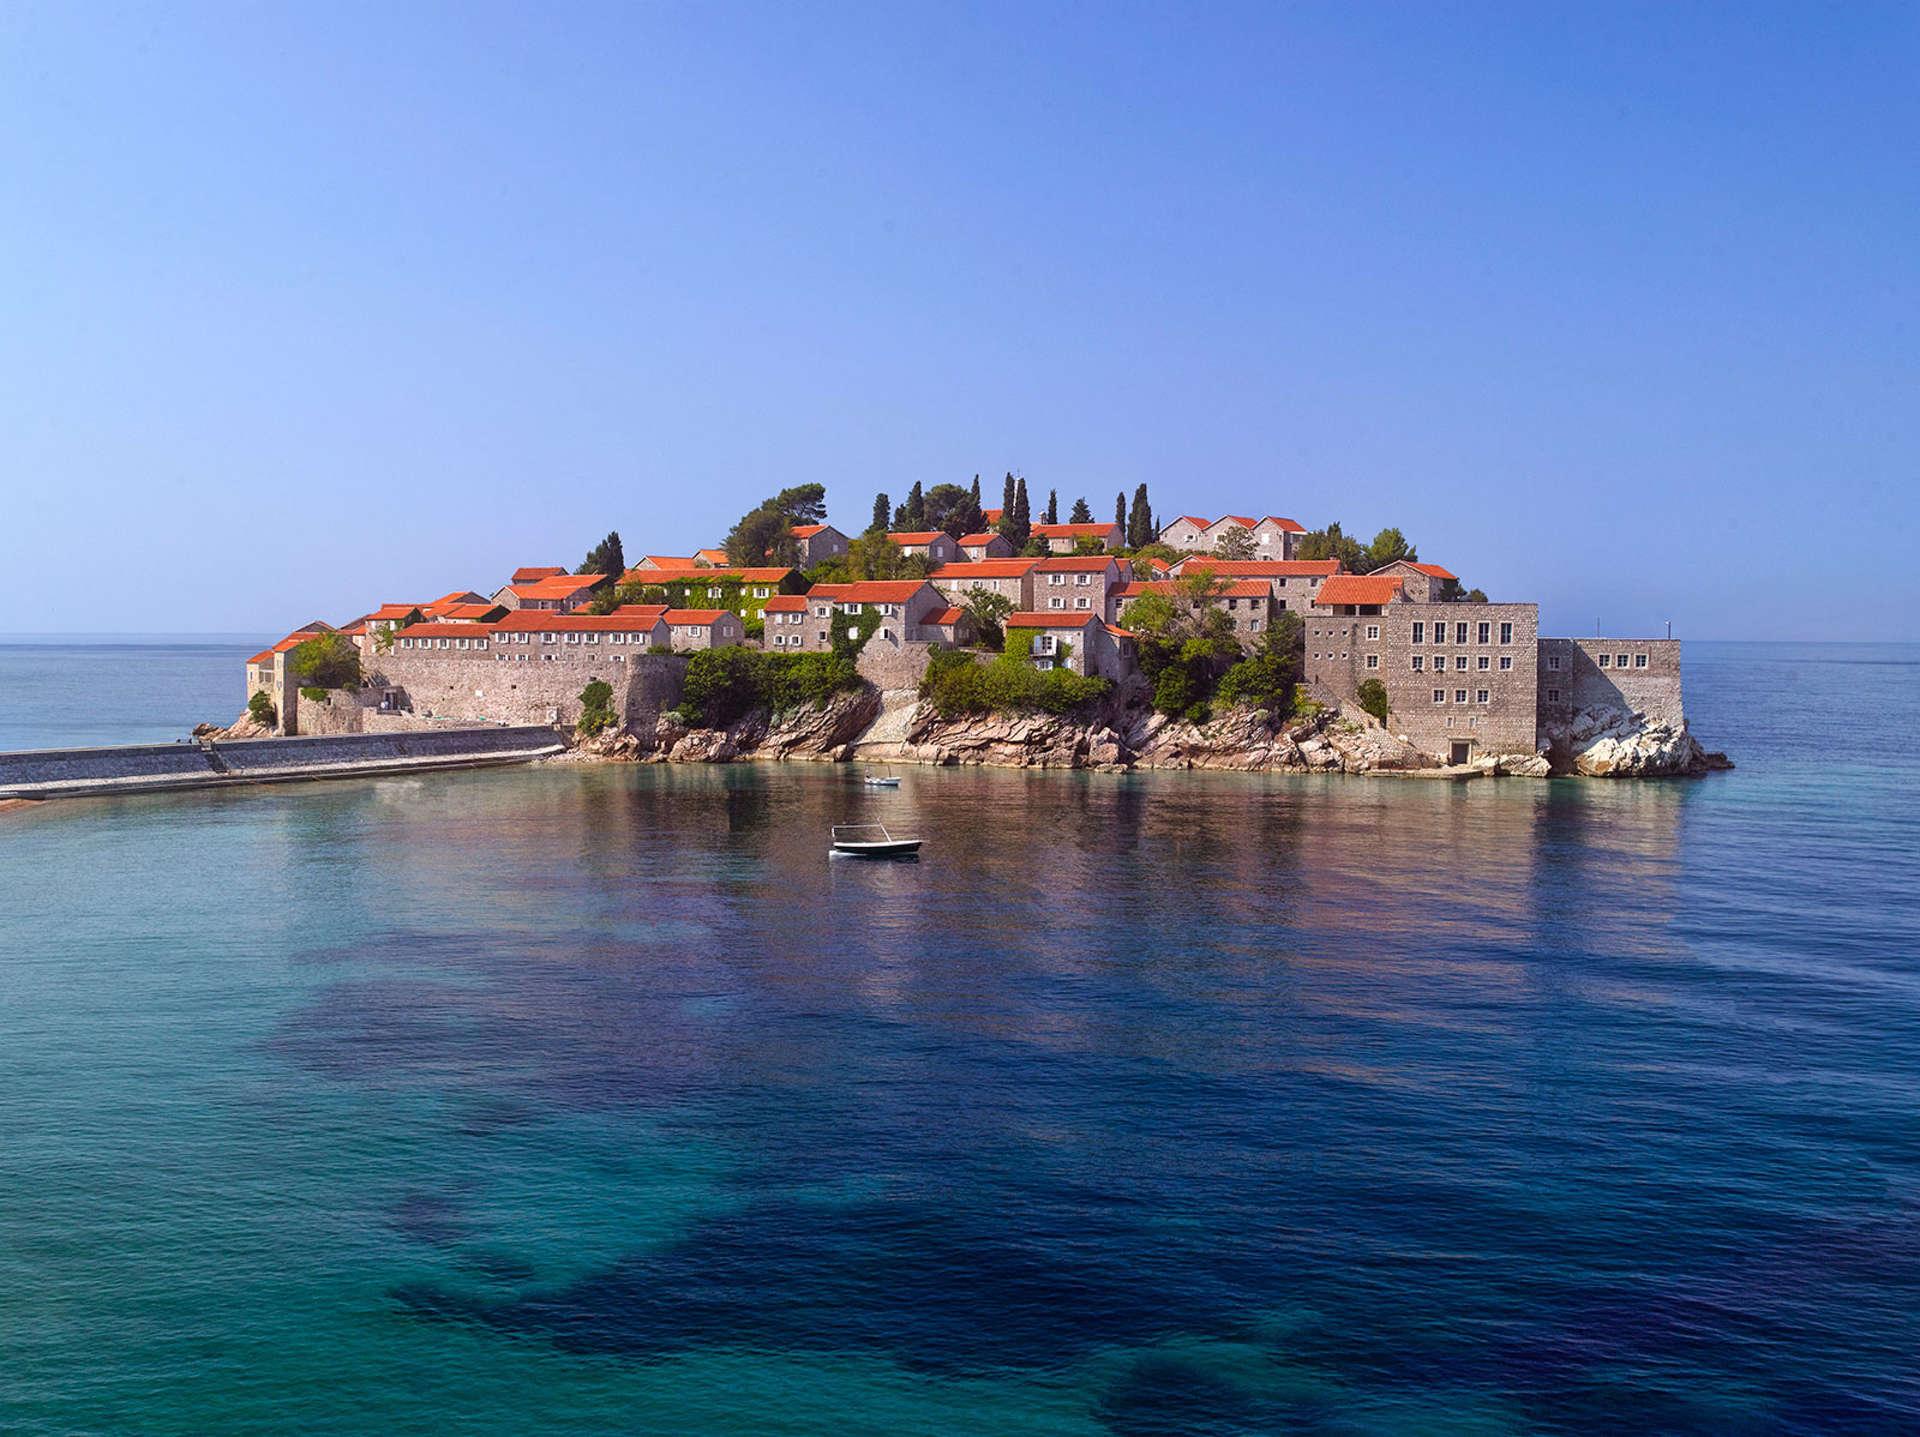 Luxury vacation rentals europe - Montenegro - Aman sveti stefan - No location 4 - Cottage | Aman Sveti Stefan - Image 1/10